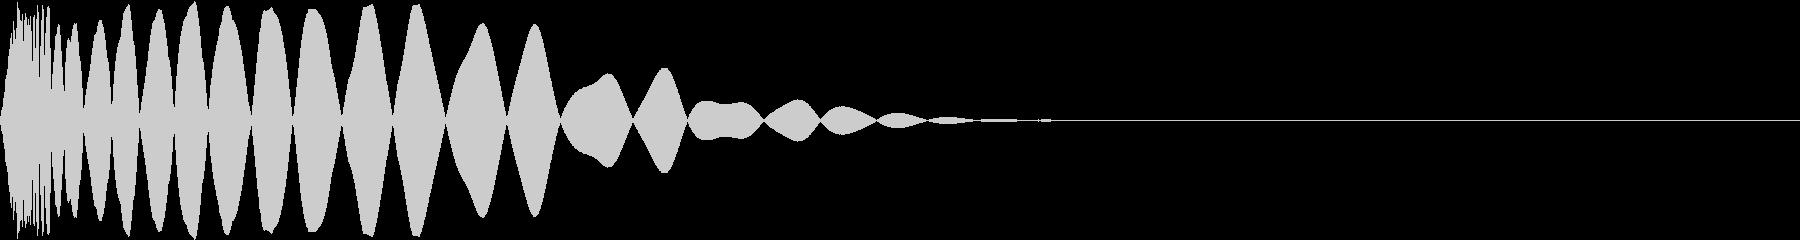 DTM Kick 76 オリジナル音源の未再生の波形